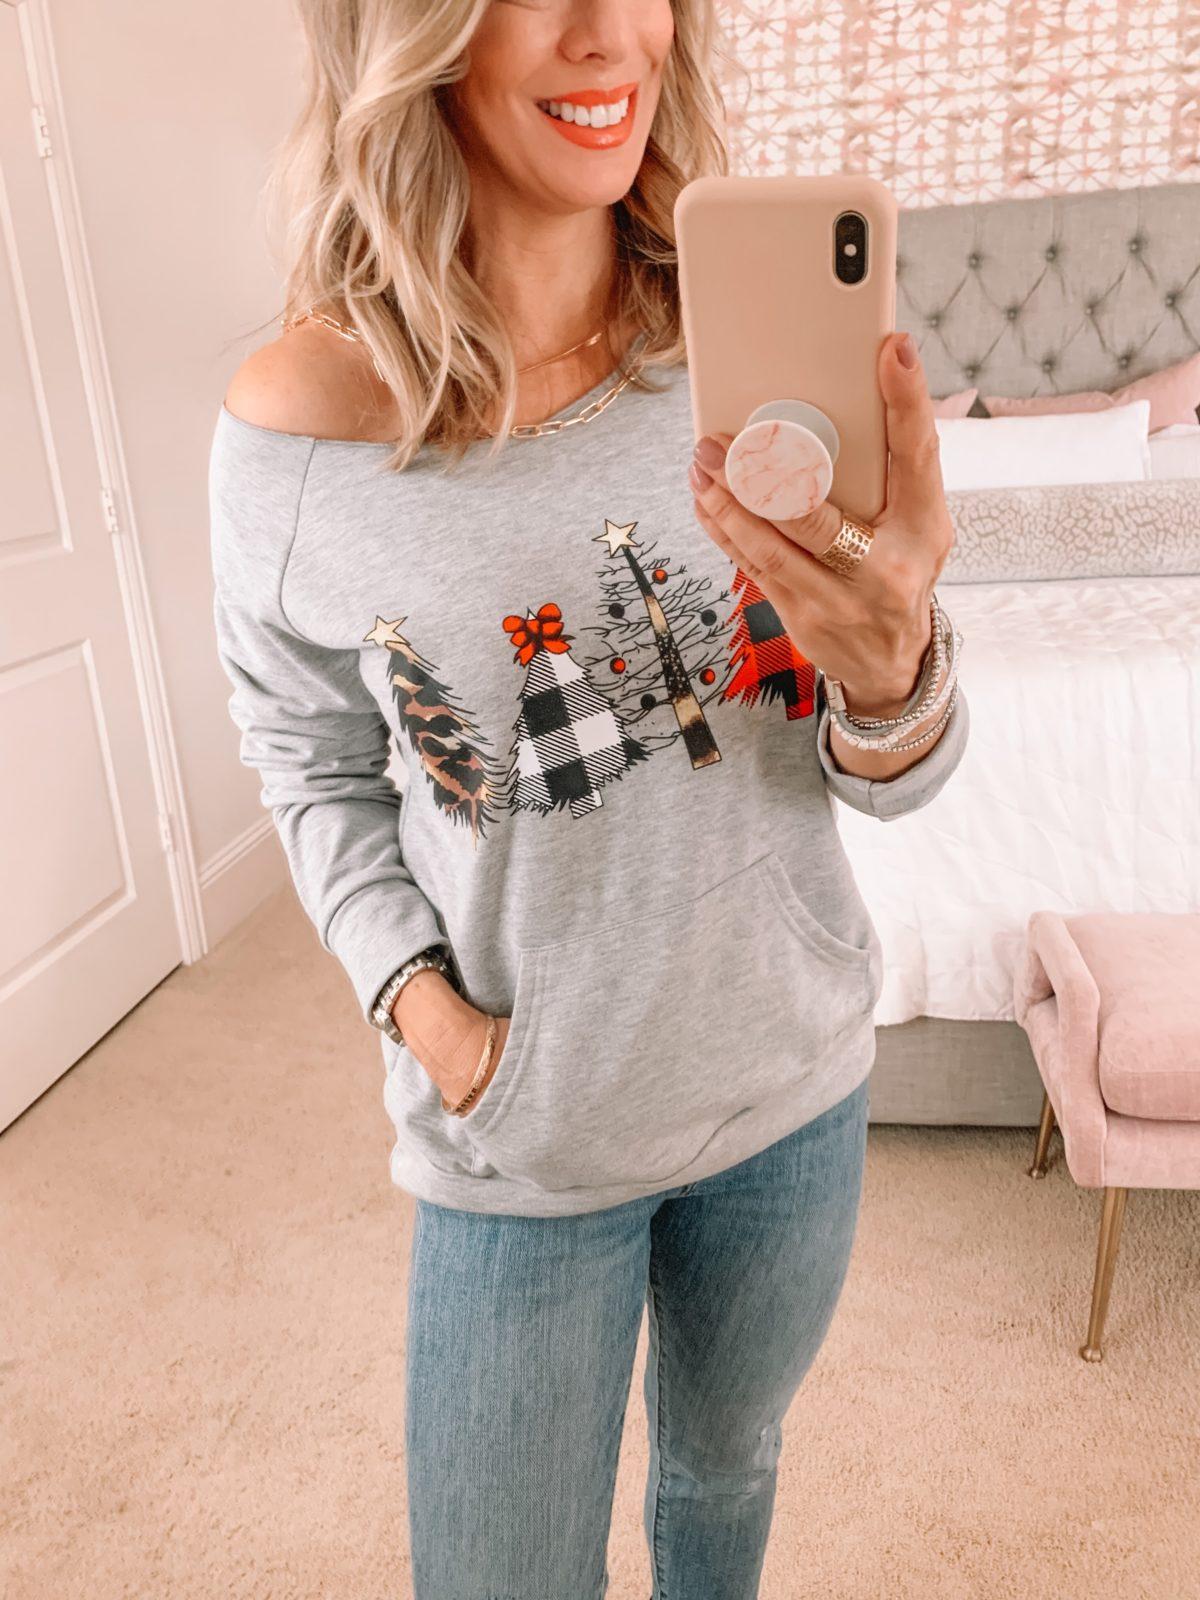 Amazon Fashion Faves, Christmas Tree Sweatshirt, Jeans